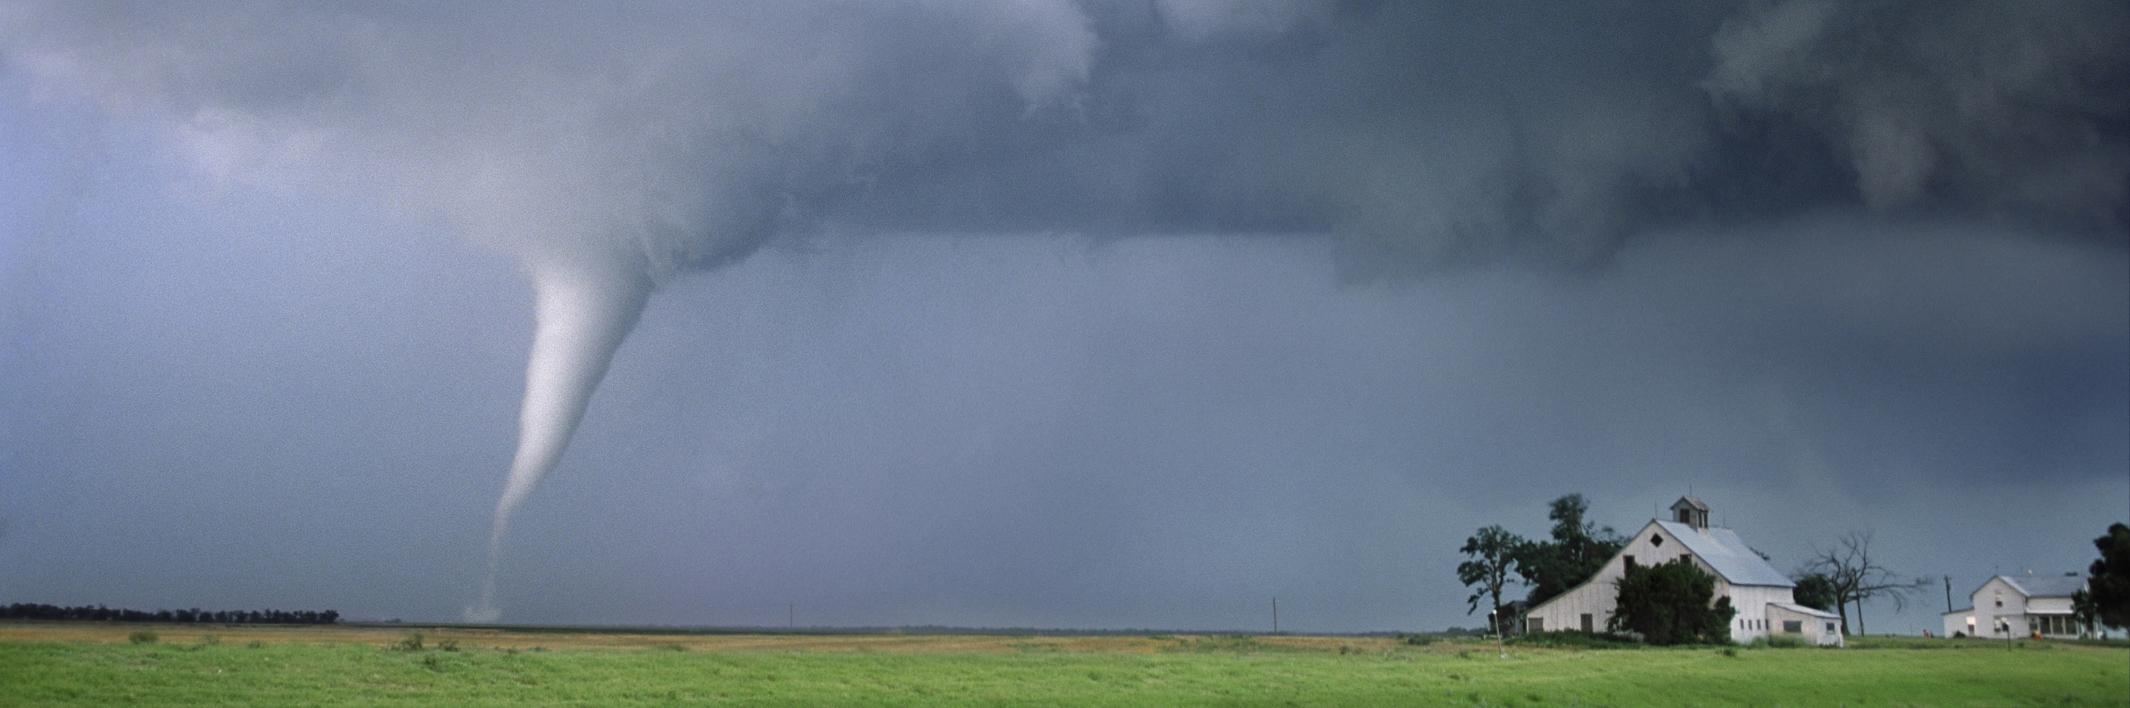 Hazard mitigation blue skies meteorological services tornado approaching homestead publicscrutiny Gallery